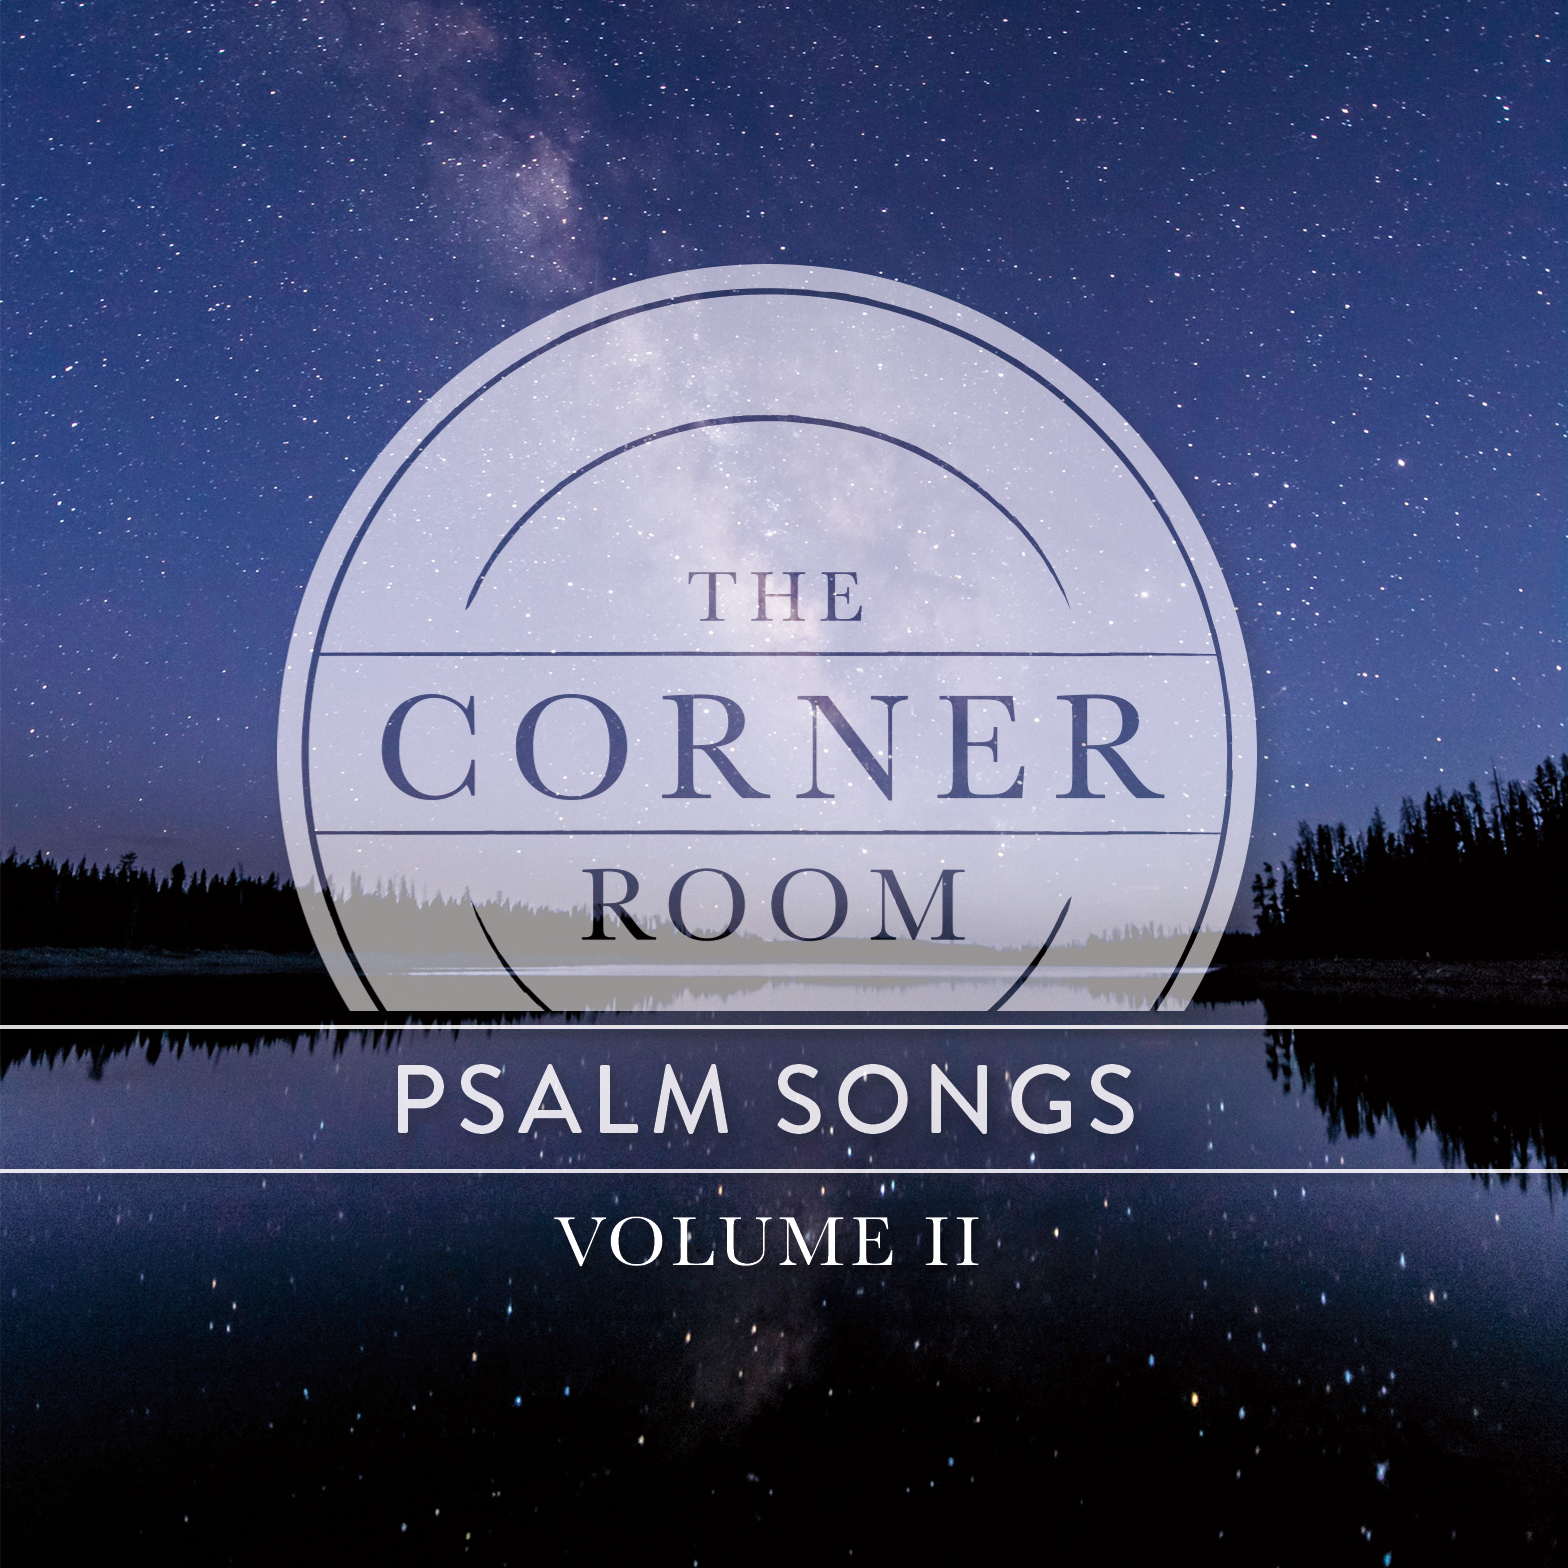 J100_Psalm-song-vol2_RBG.jpg